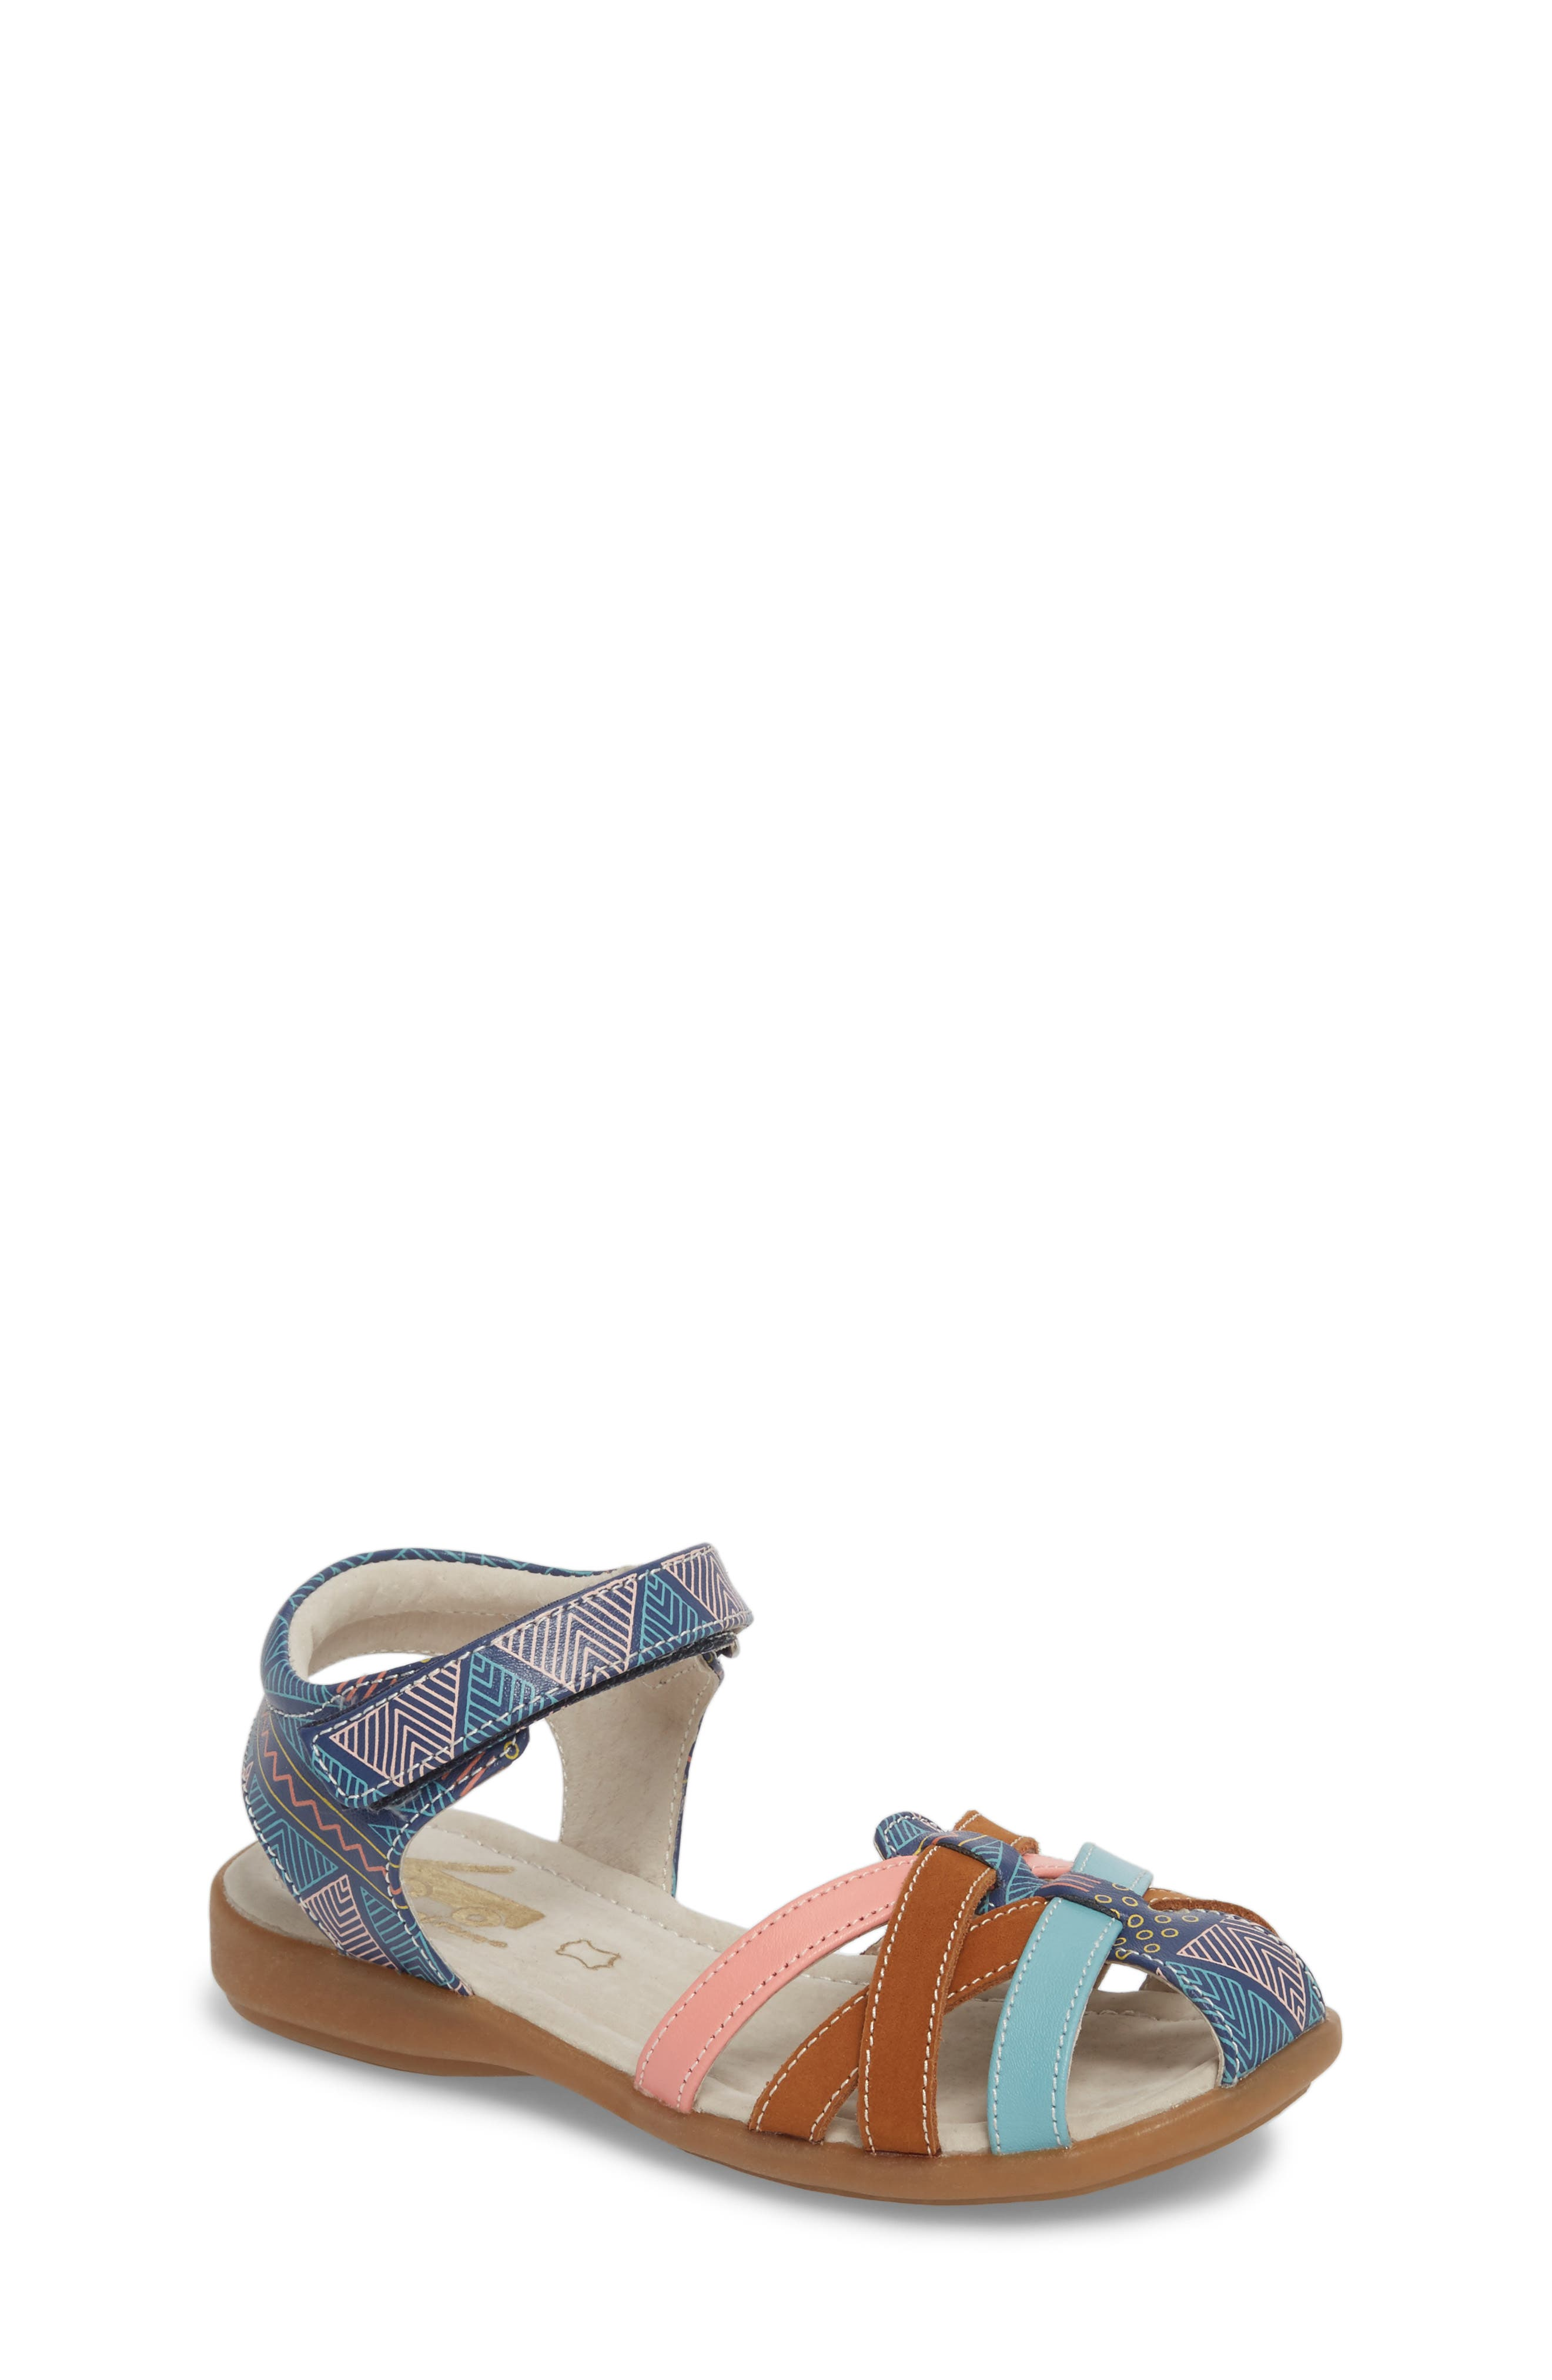 'Camila' Sandal,                         Main,                         color,